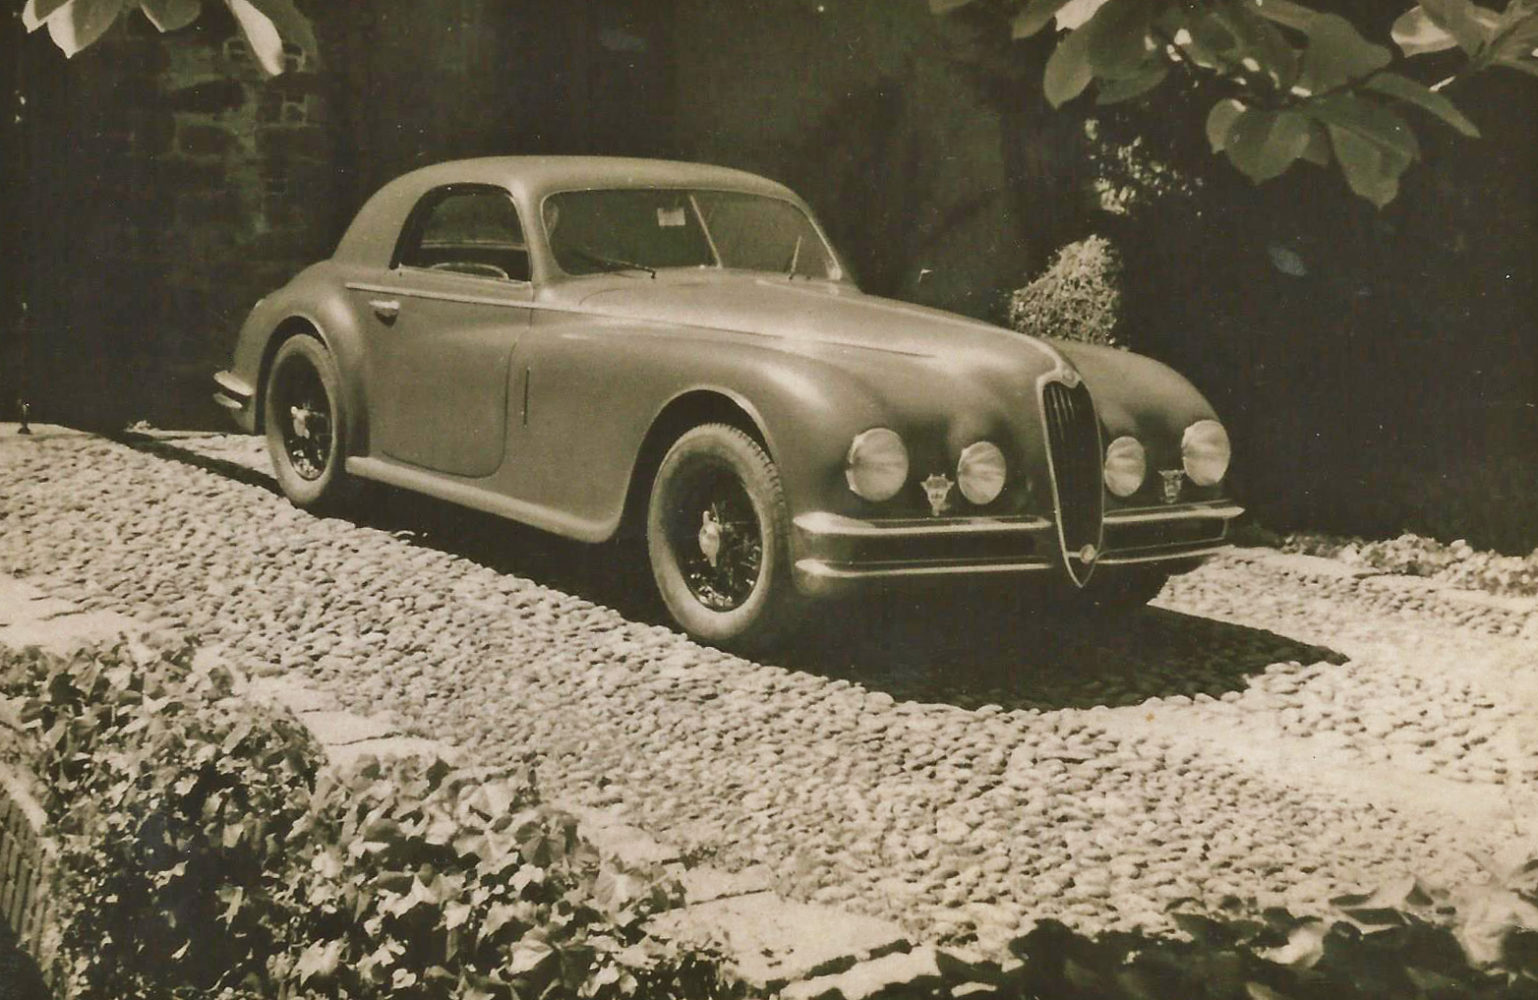 Car of the Week: Alfa Romeo 6C 2500 SS 'Trossi'